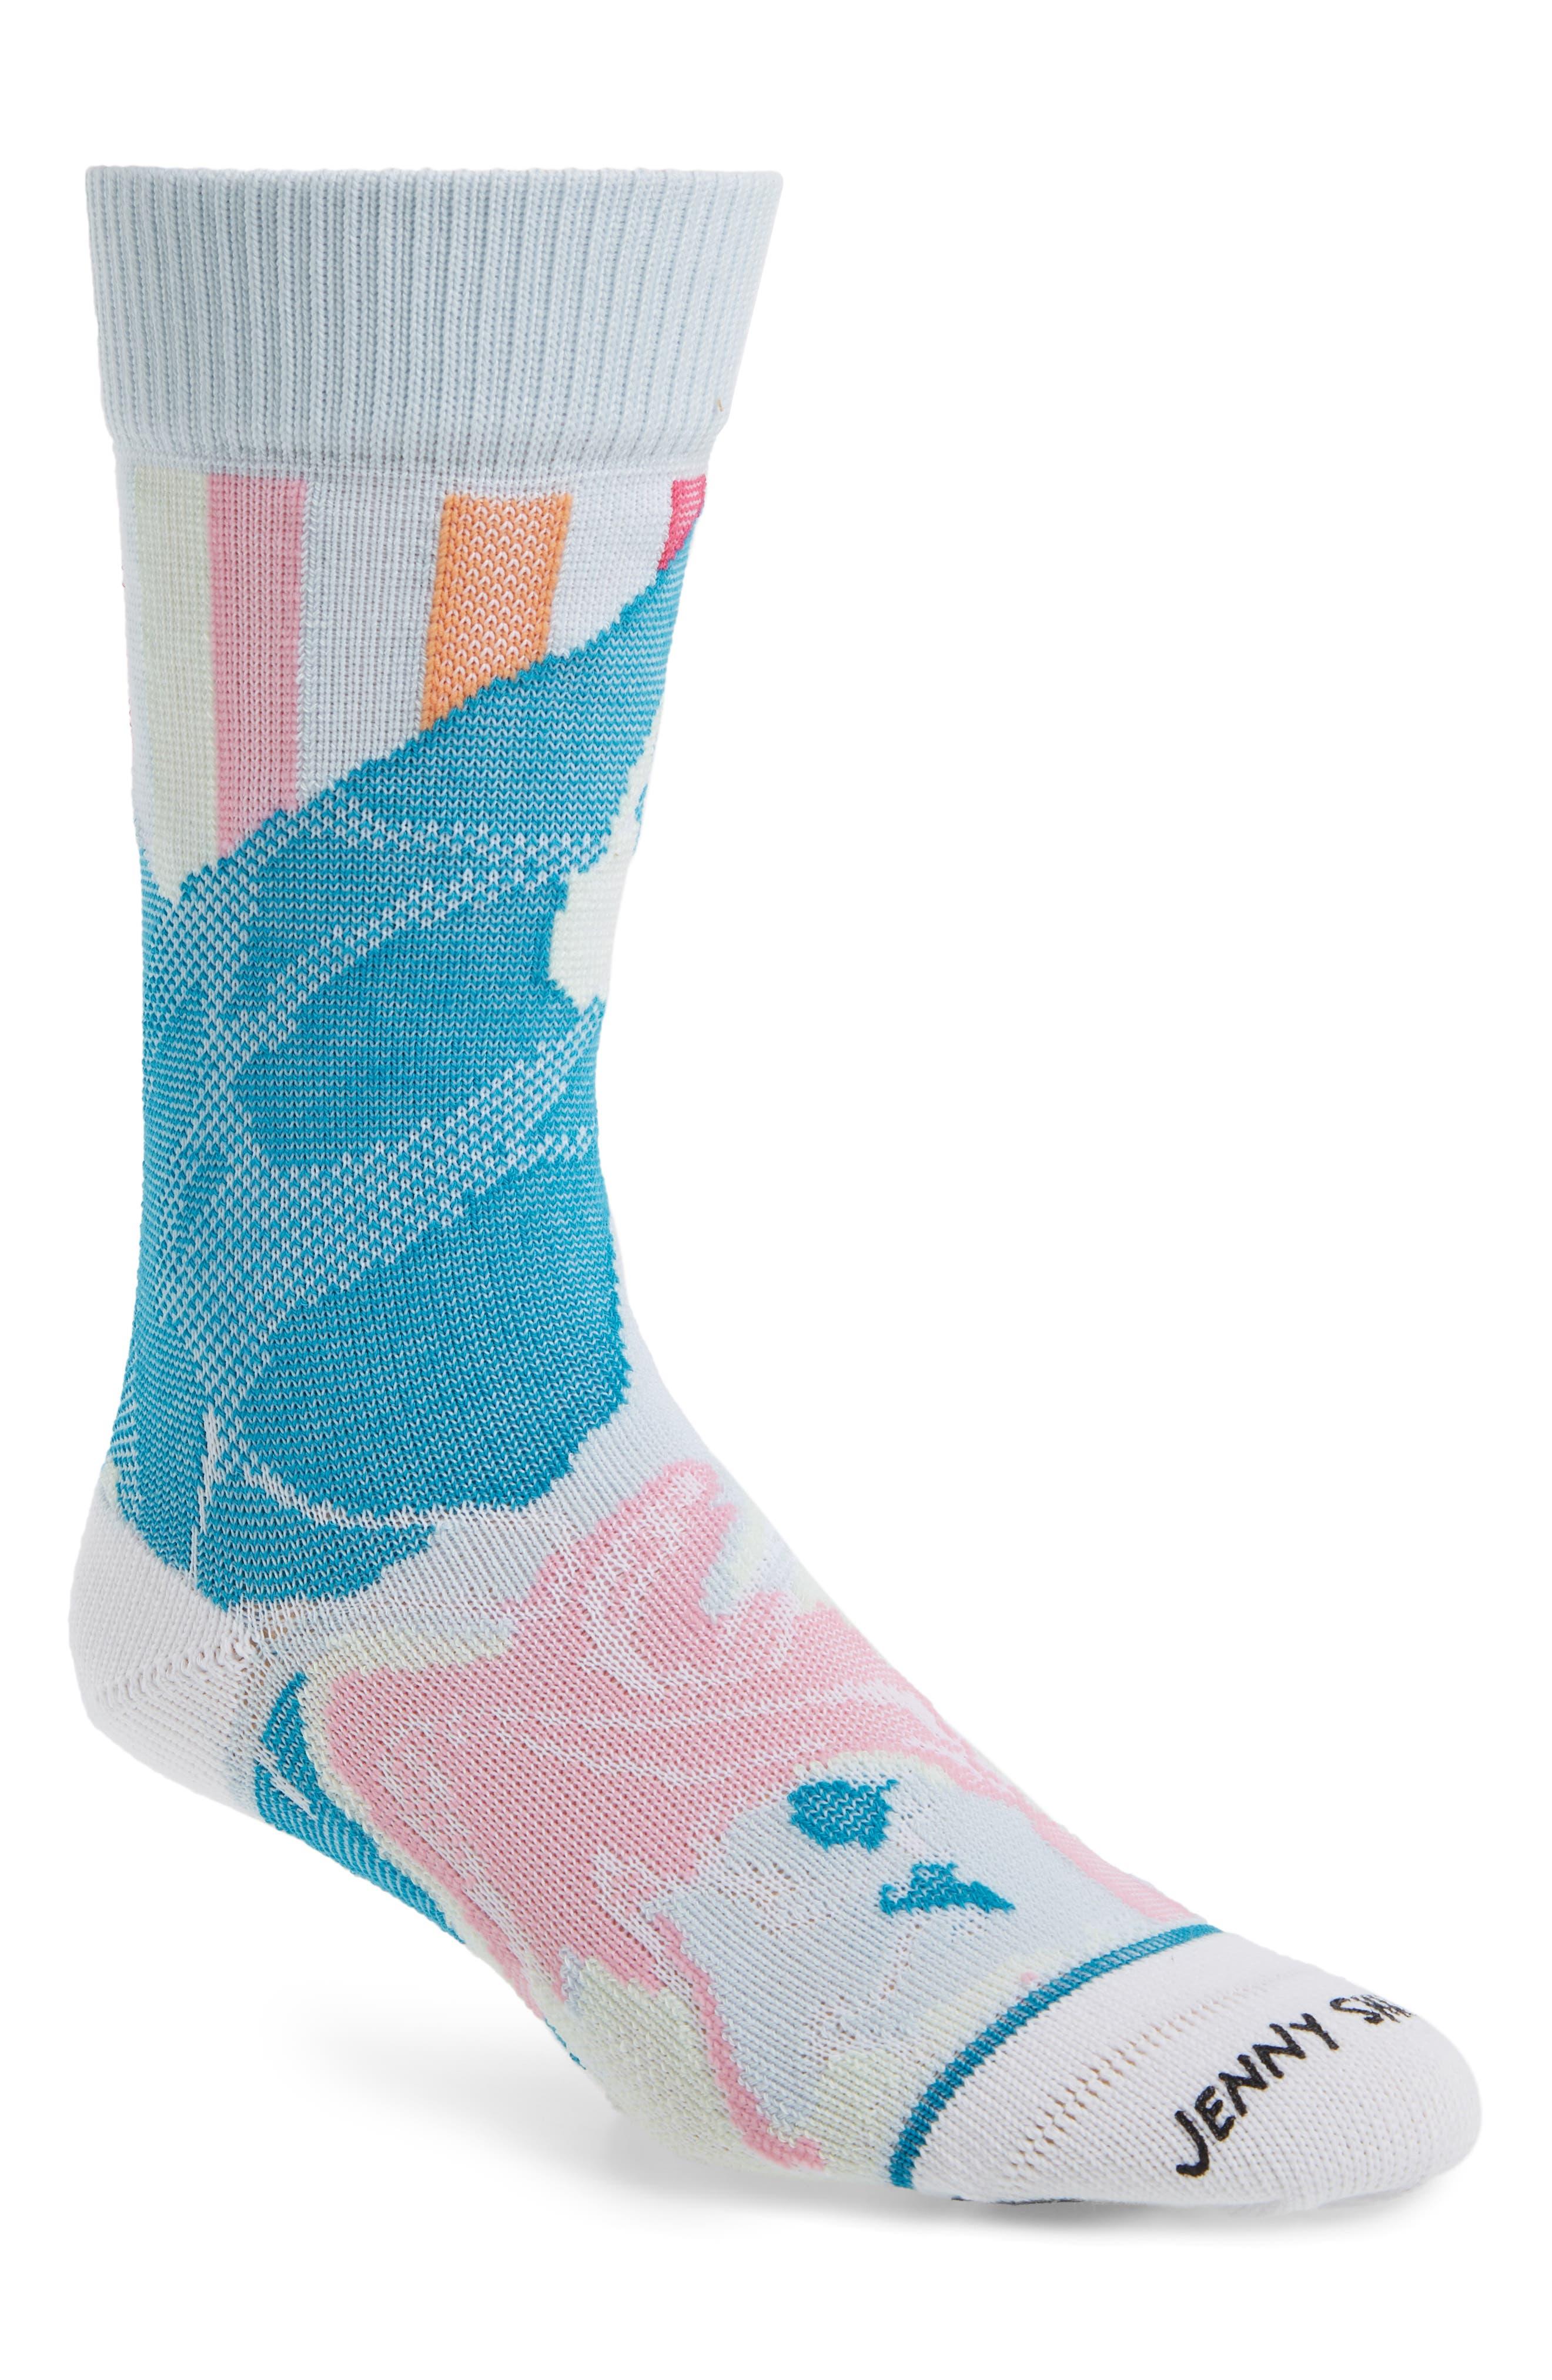 STANCE, Spilled Color Crew Socks, Main thumbnail 1, color, BLUE